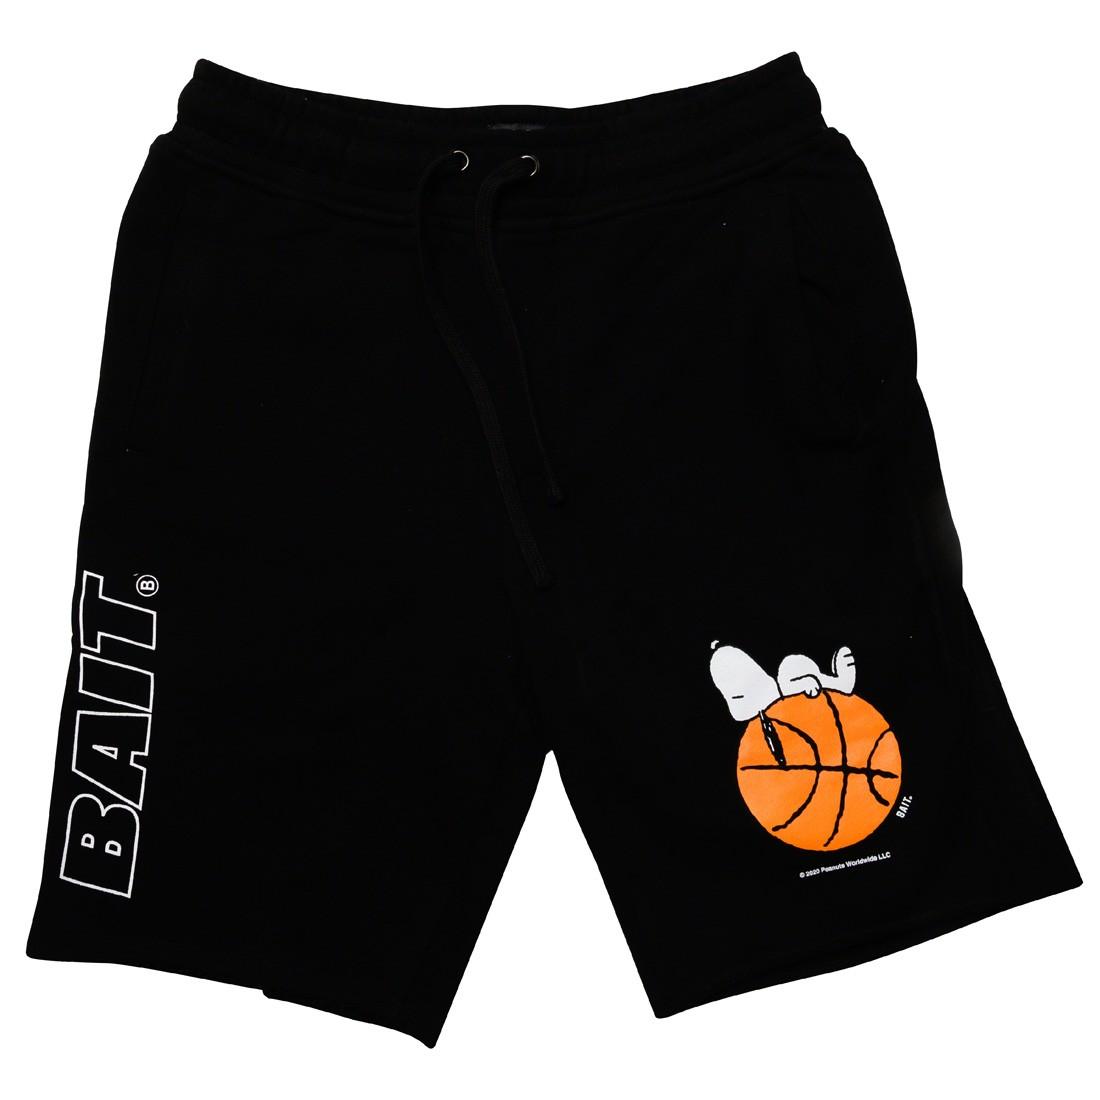 BAIT x Snoopy Men Snoopy Sleeper Baller Shorts (black)